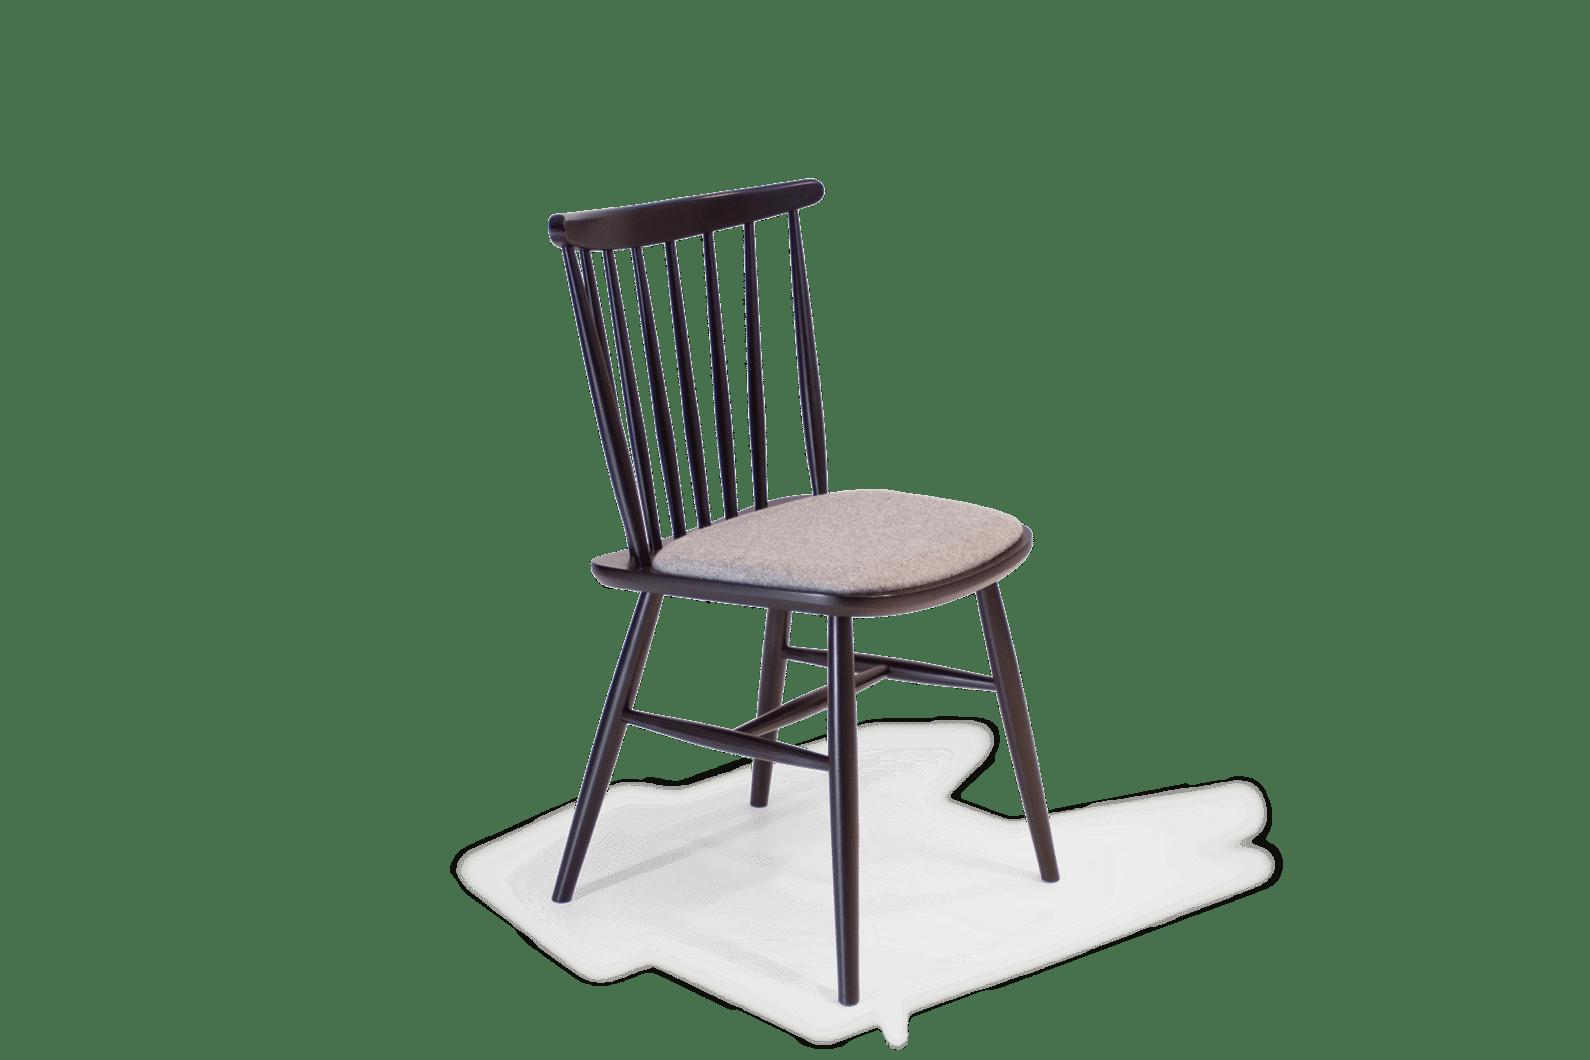 CH Da Vinci Chair Painted Black Uphol